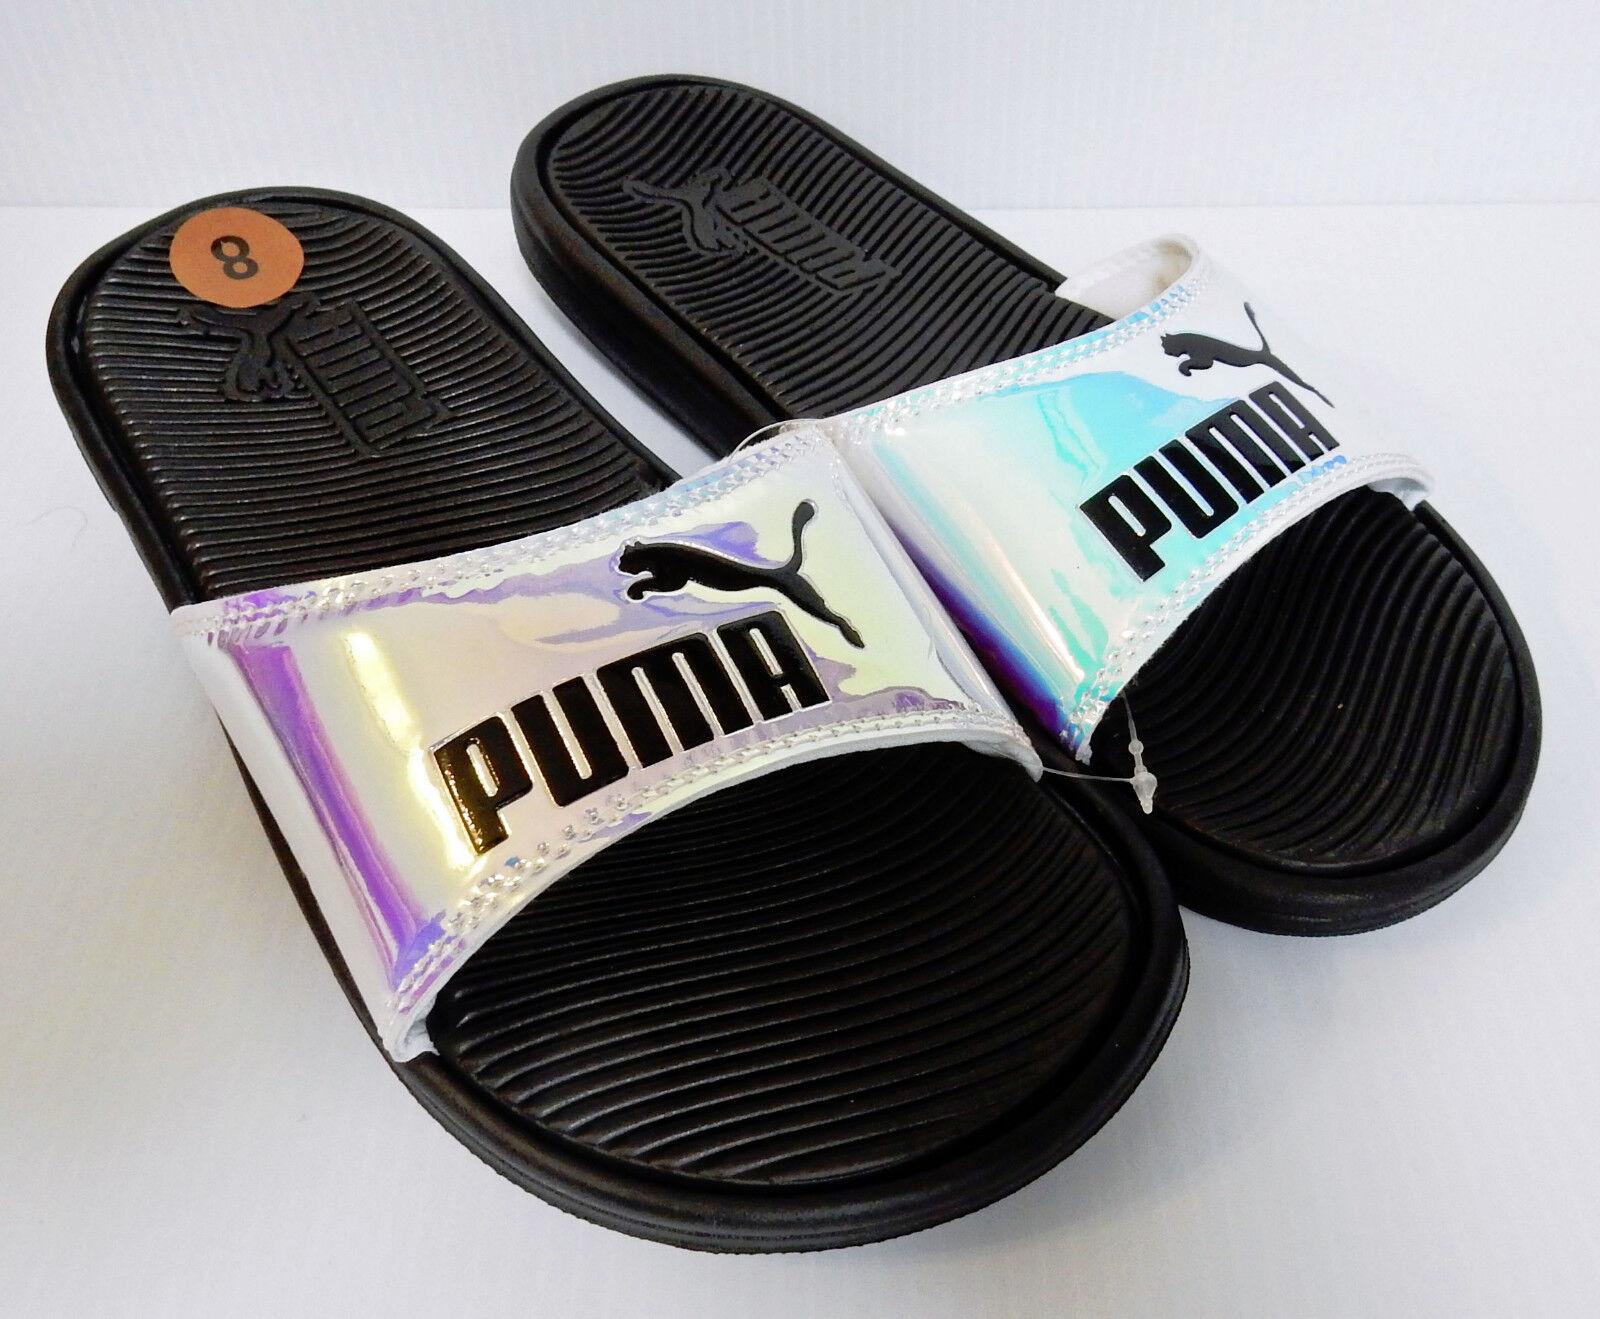 NEW PUMA Women's College Pop Cat Blk PEARL IRIDESCENT Slide Sandals Blk Cat Logo Sz 8 f5aff5